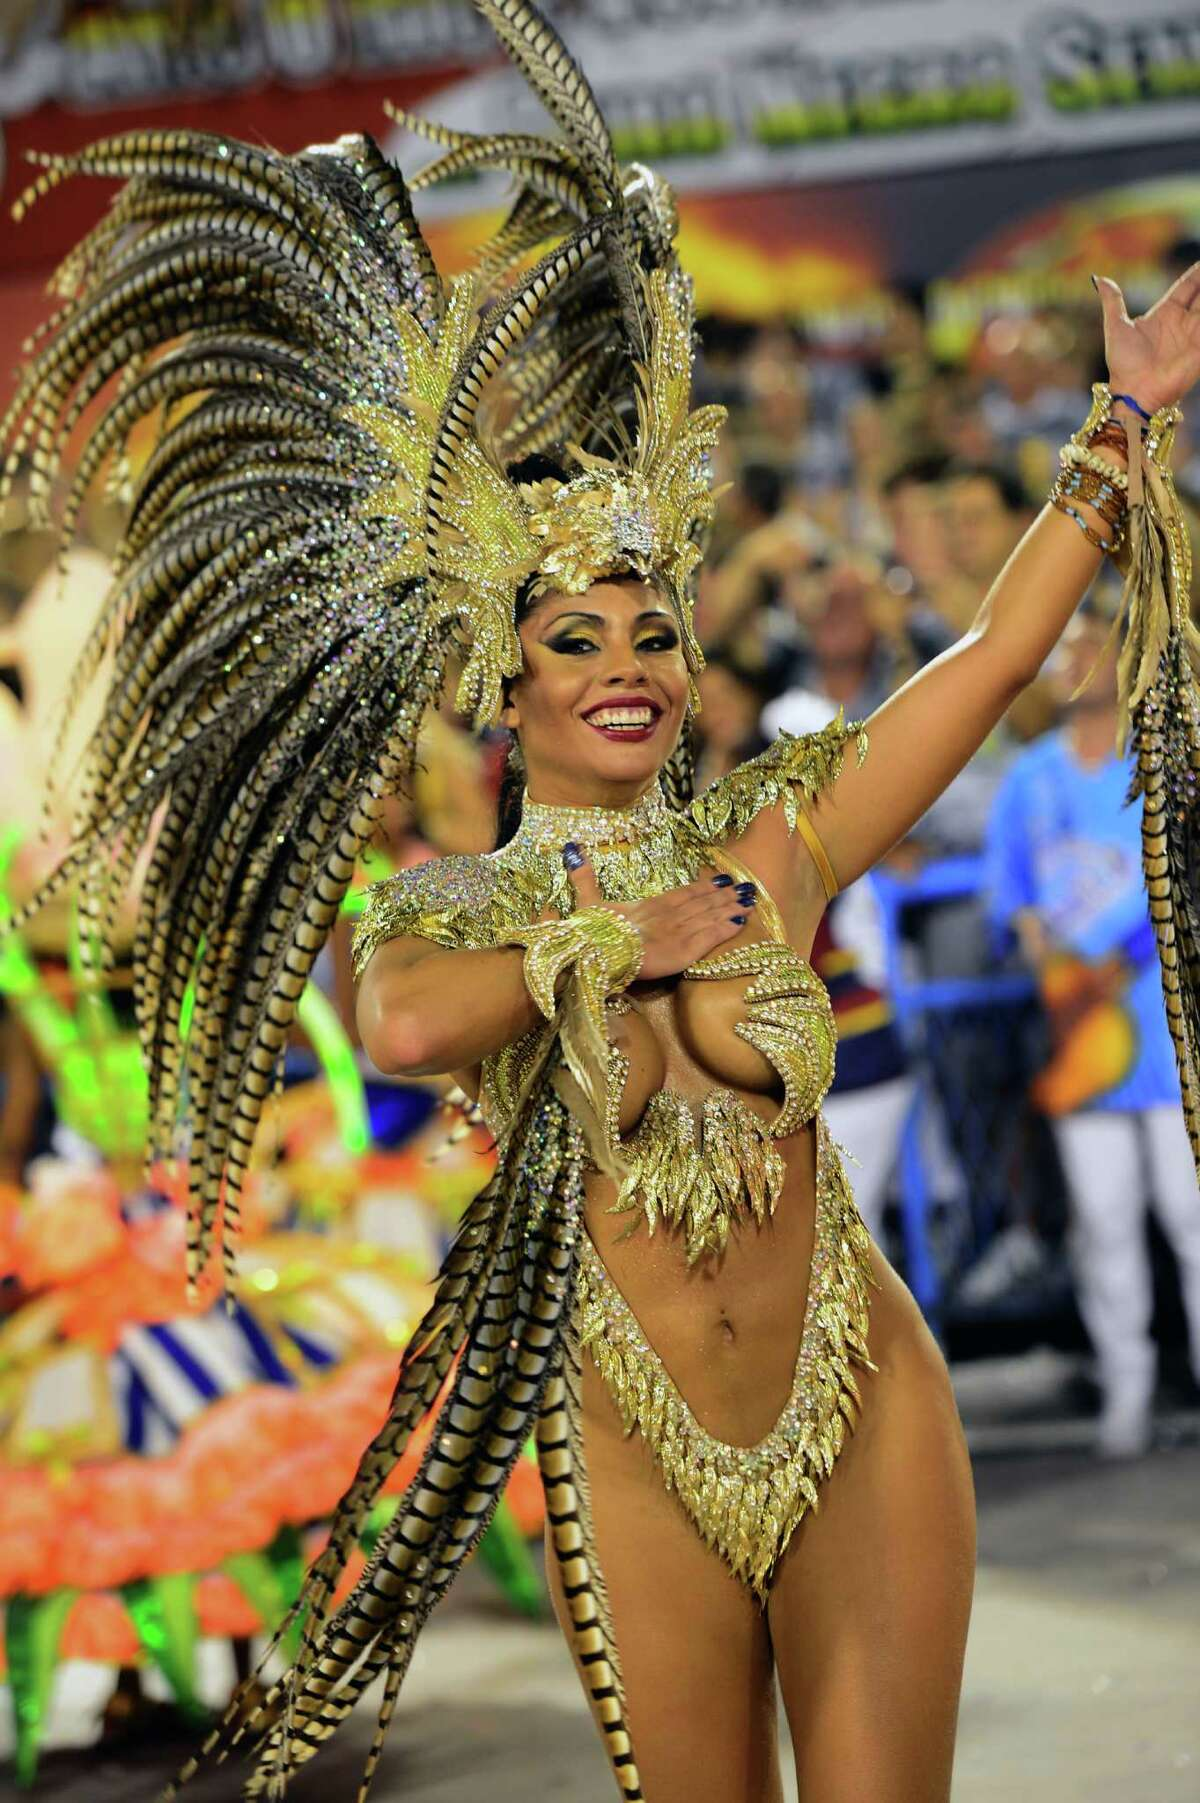 A reveler of Portela samba school performs during the first night of Carnival parade at the Sambadrome in Rio de Janeiro on February 11, 2013. AFP PHOTO / CHRISTOPHE SIMON